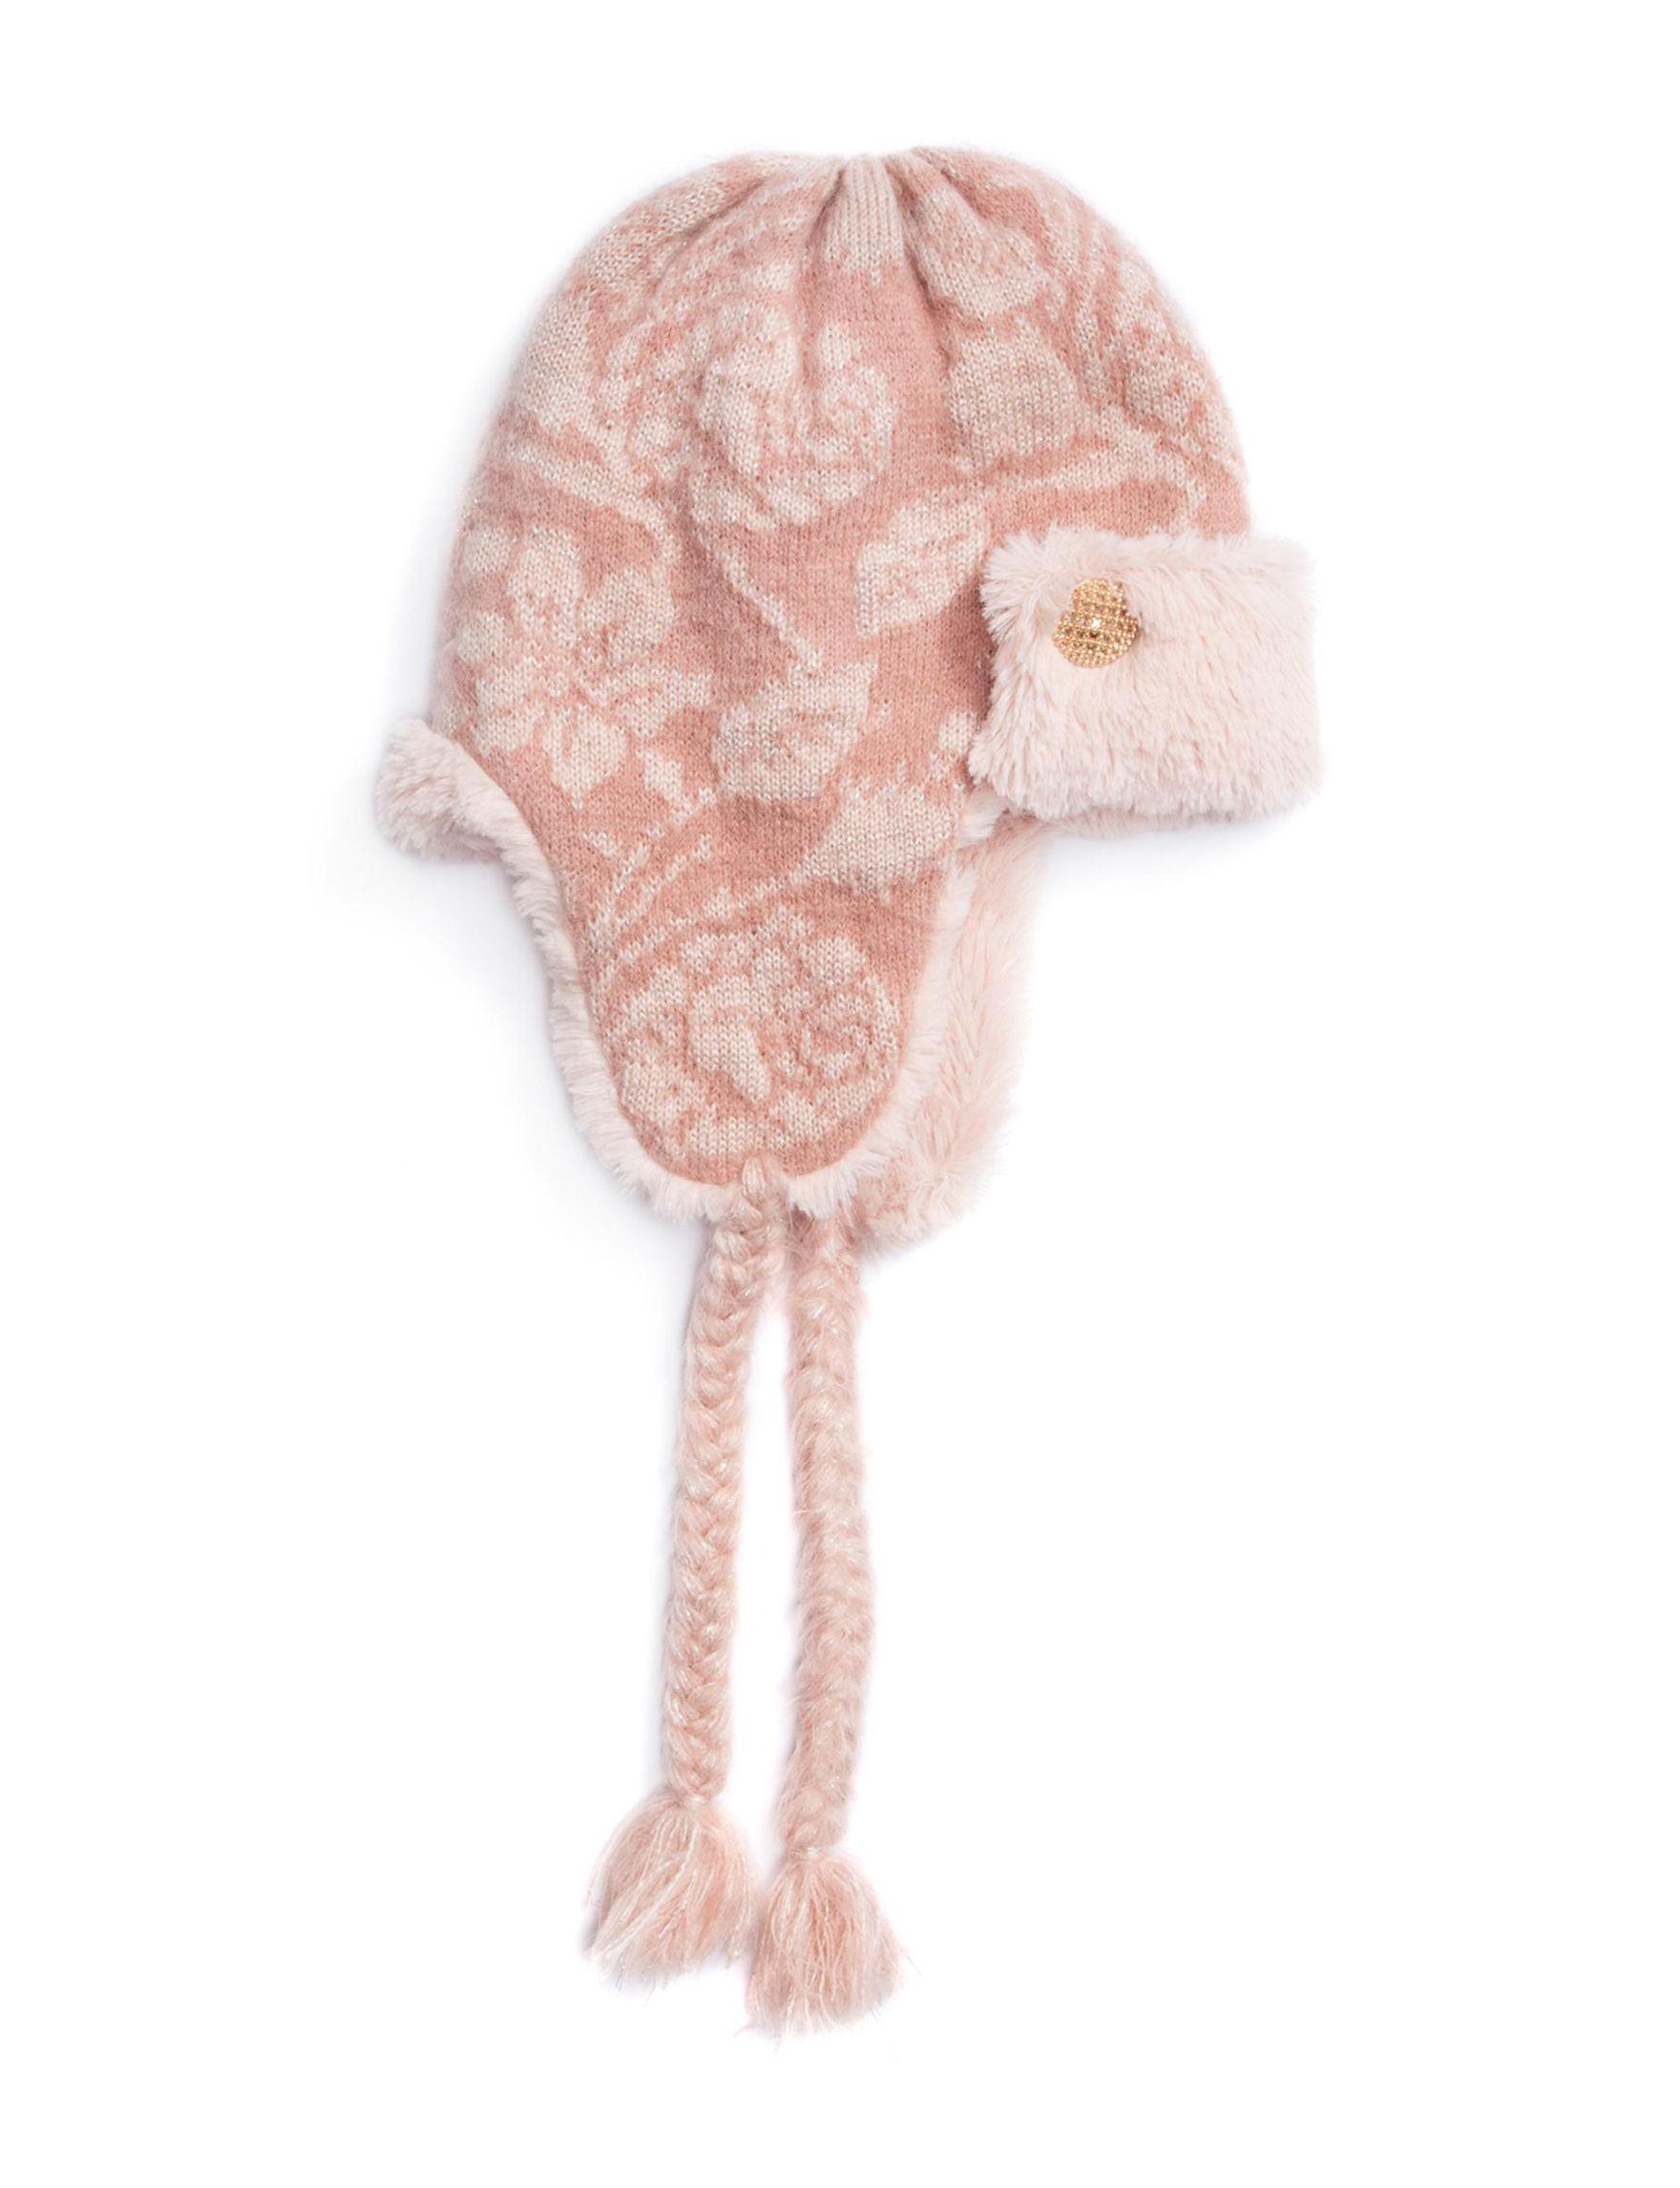 Muk Luks Rose Gold Hats & Headwear